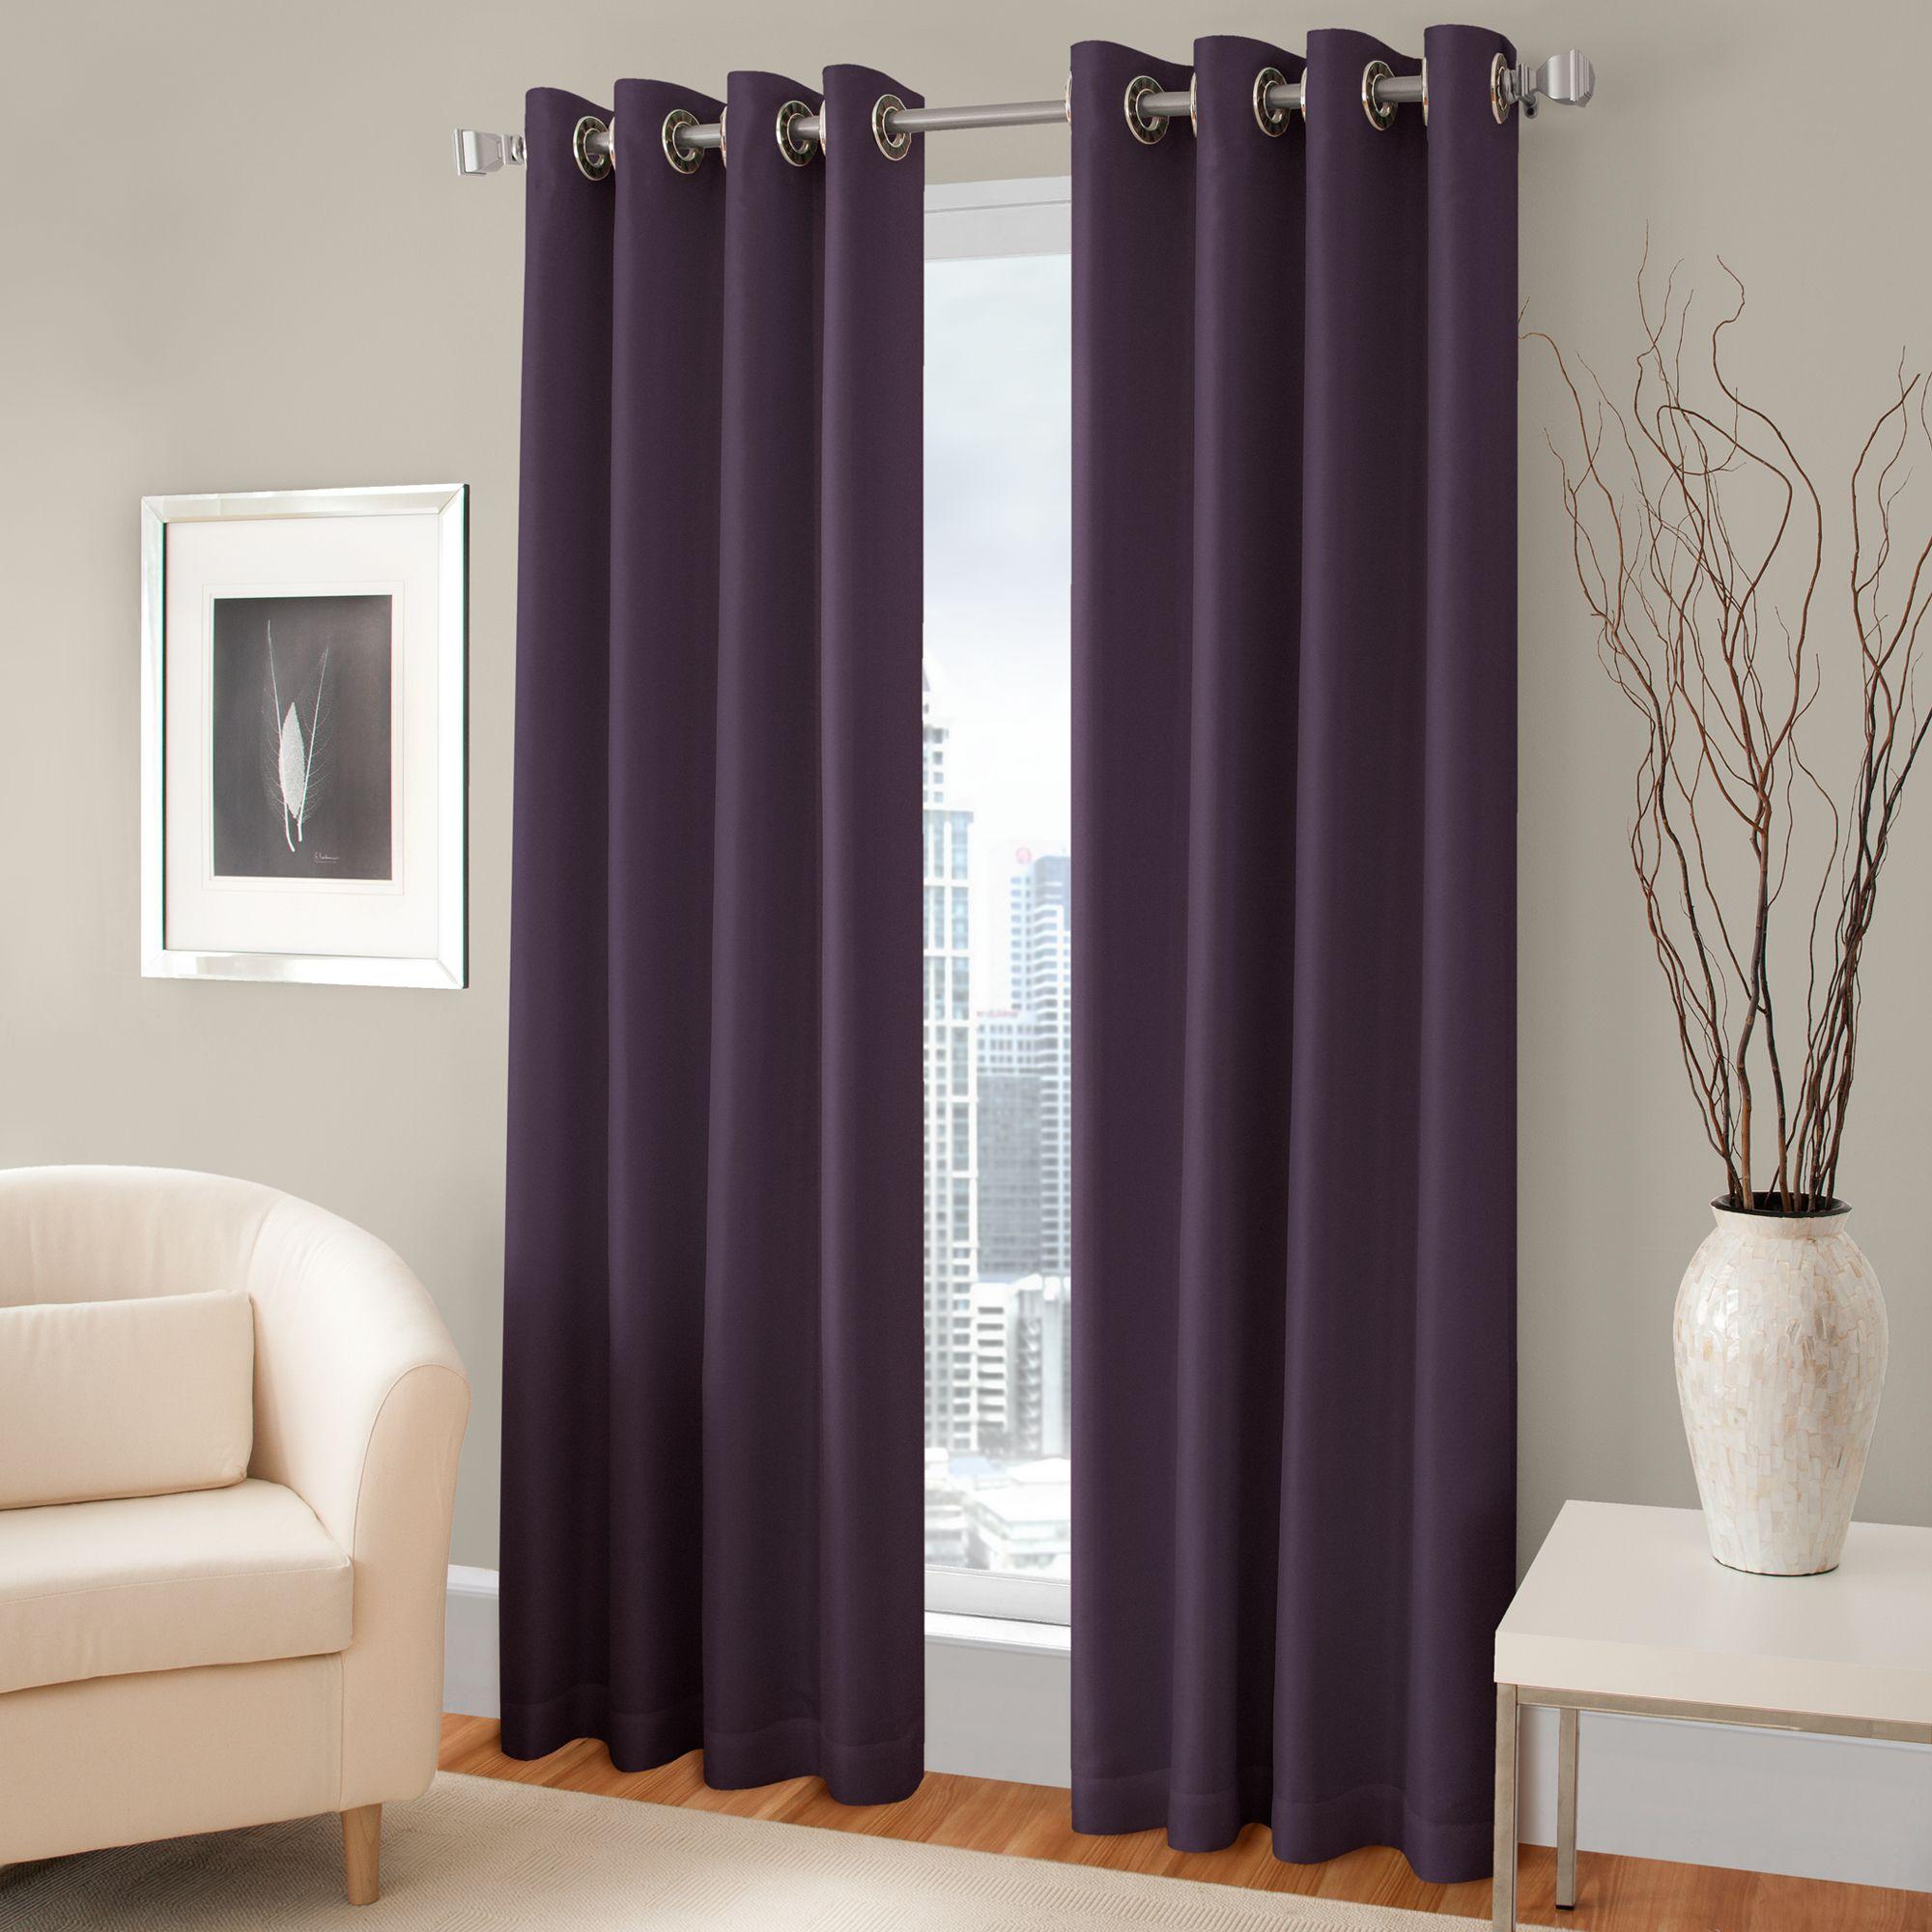 Majestic Blackout Lined Grommet Window Curtain Panel Bed Bath & Beyond